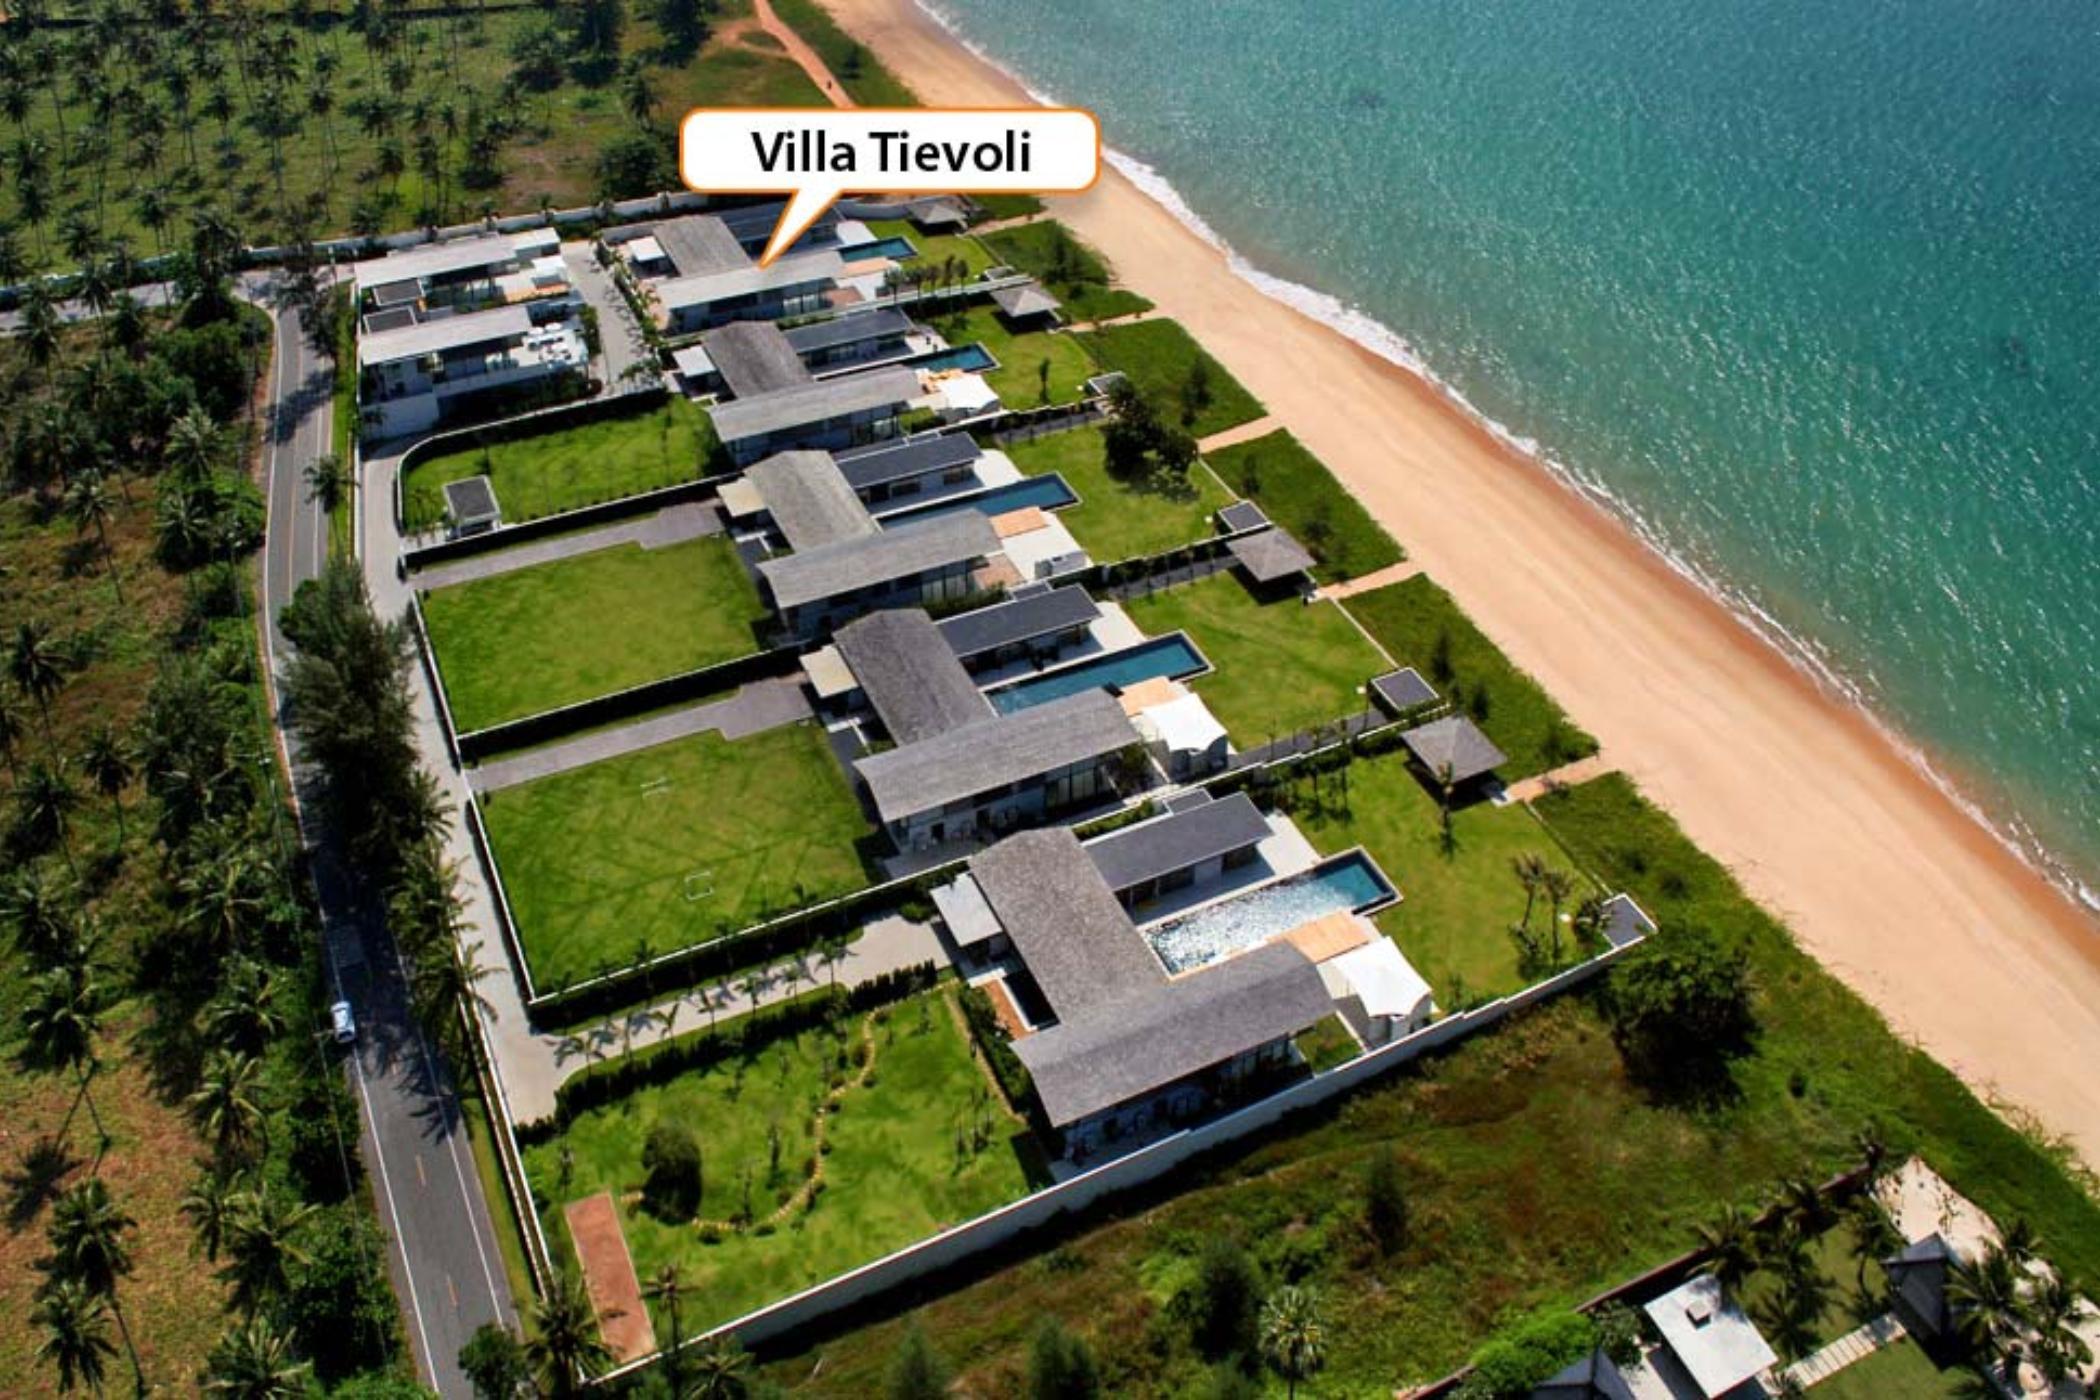 Tievoli 1 at Sava Villas